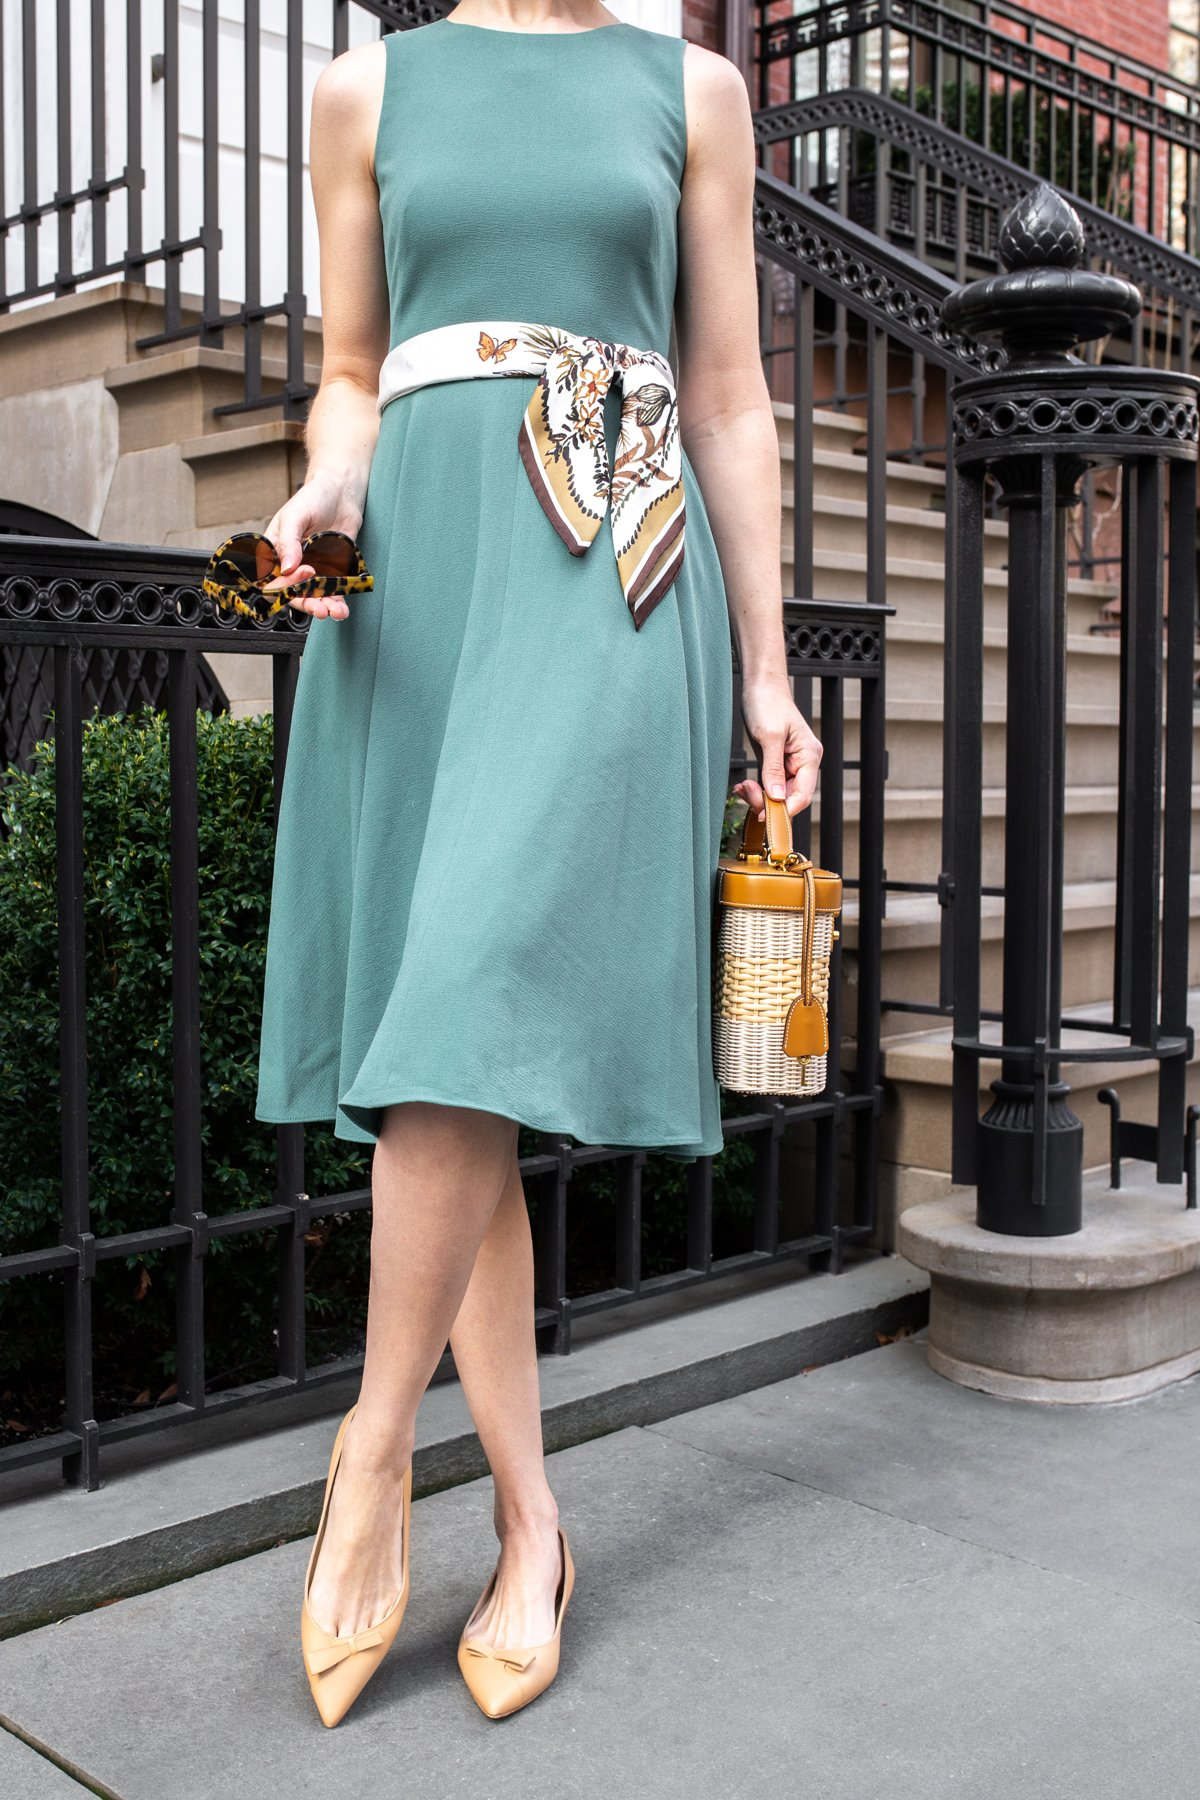 Stacie Flinner How to Style a Silk Scarf-2.jpg